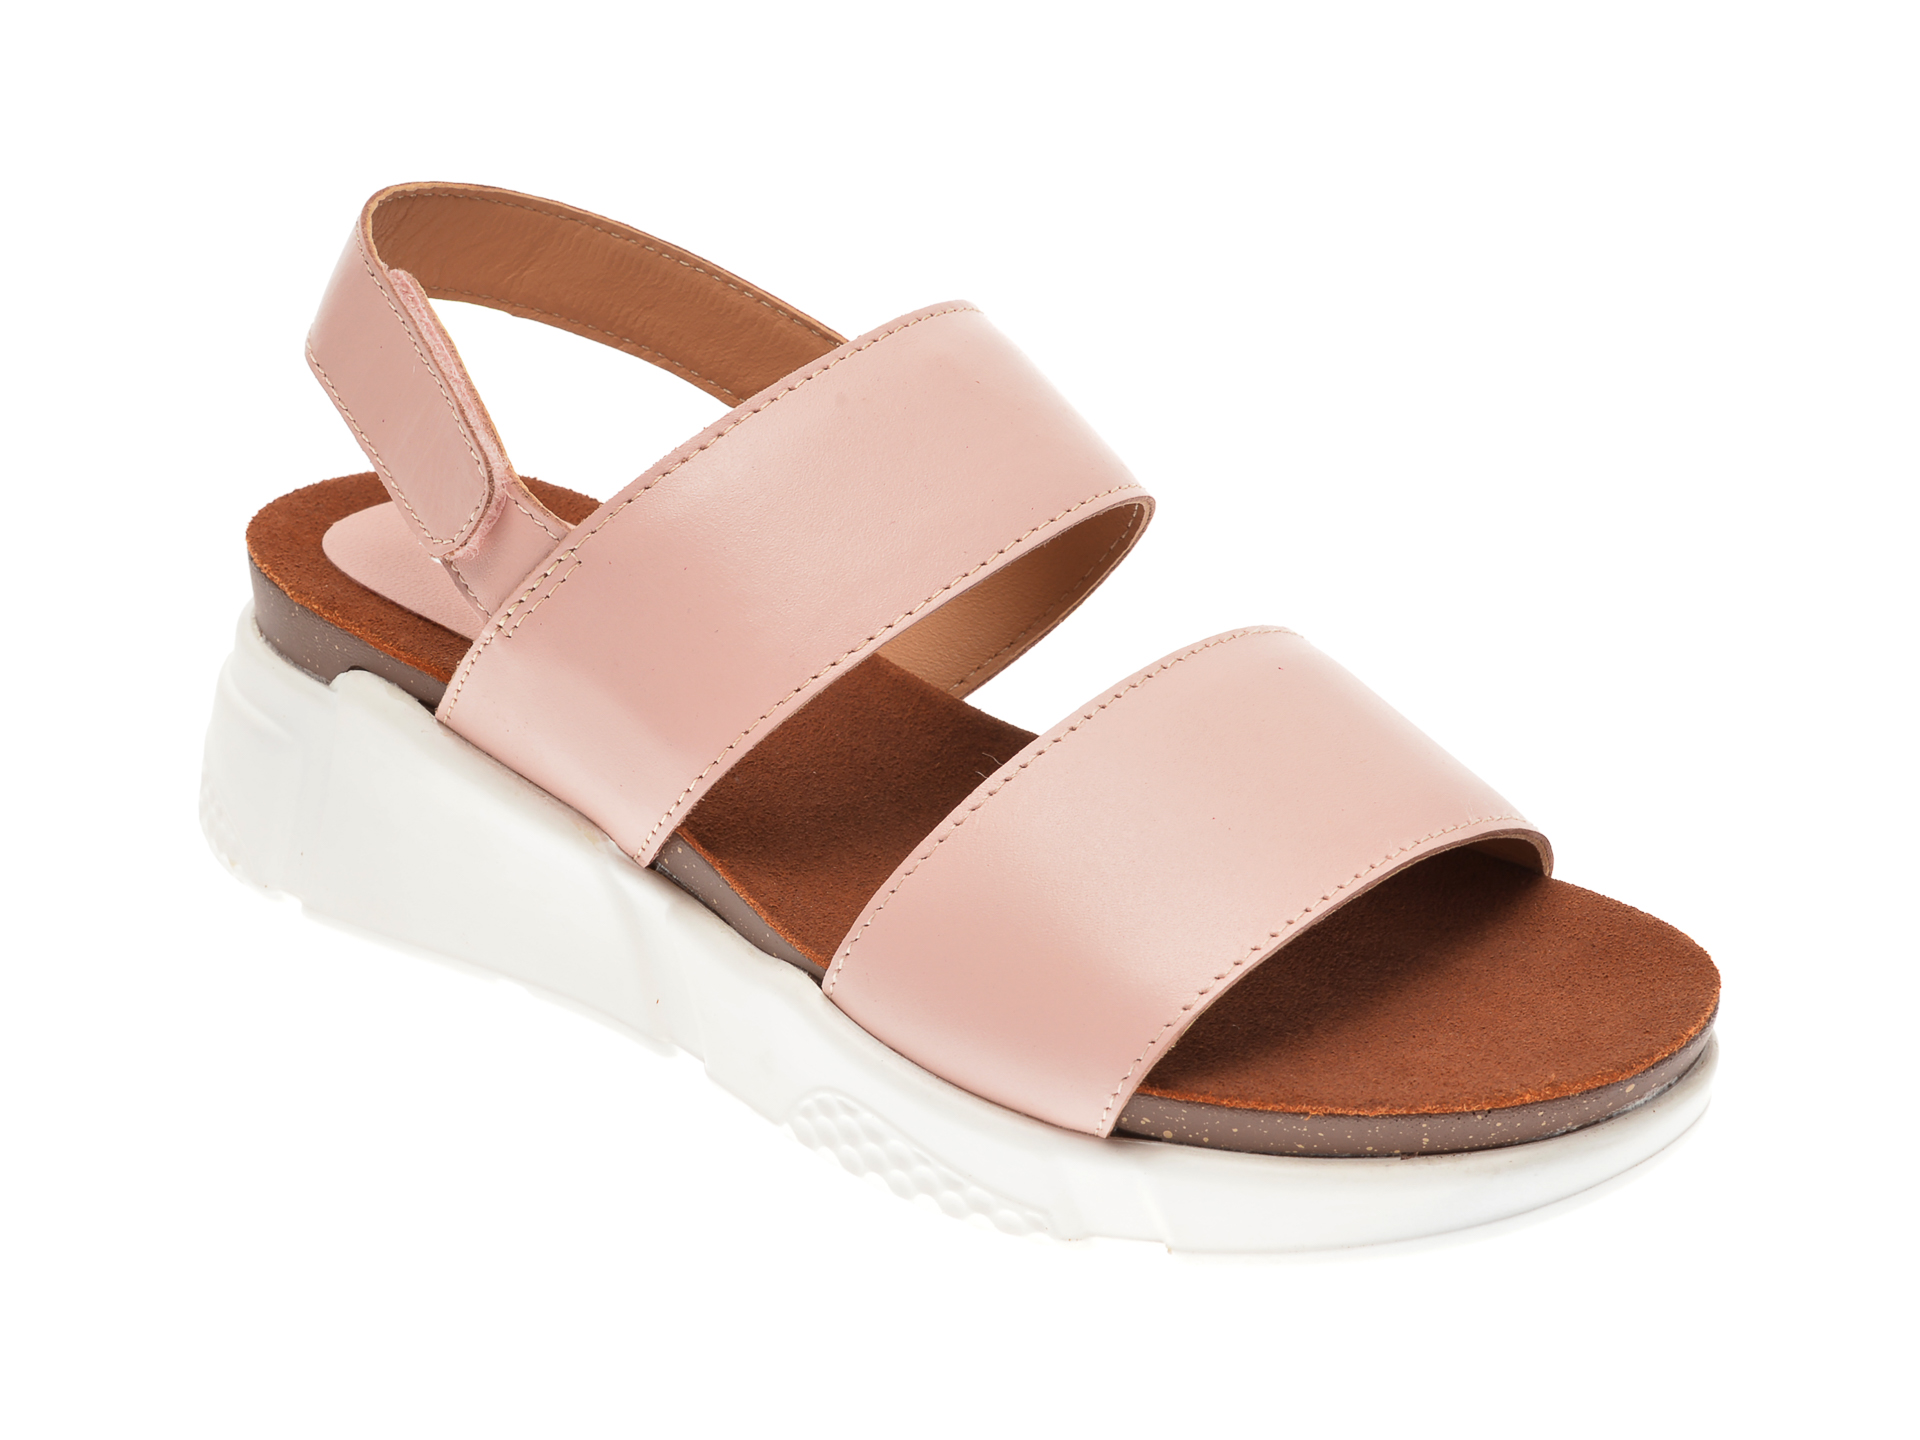 Sandale Image Roz, Sh57, Din Piele Naturala